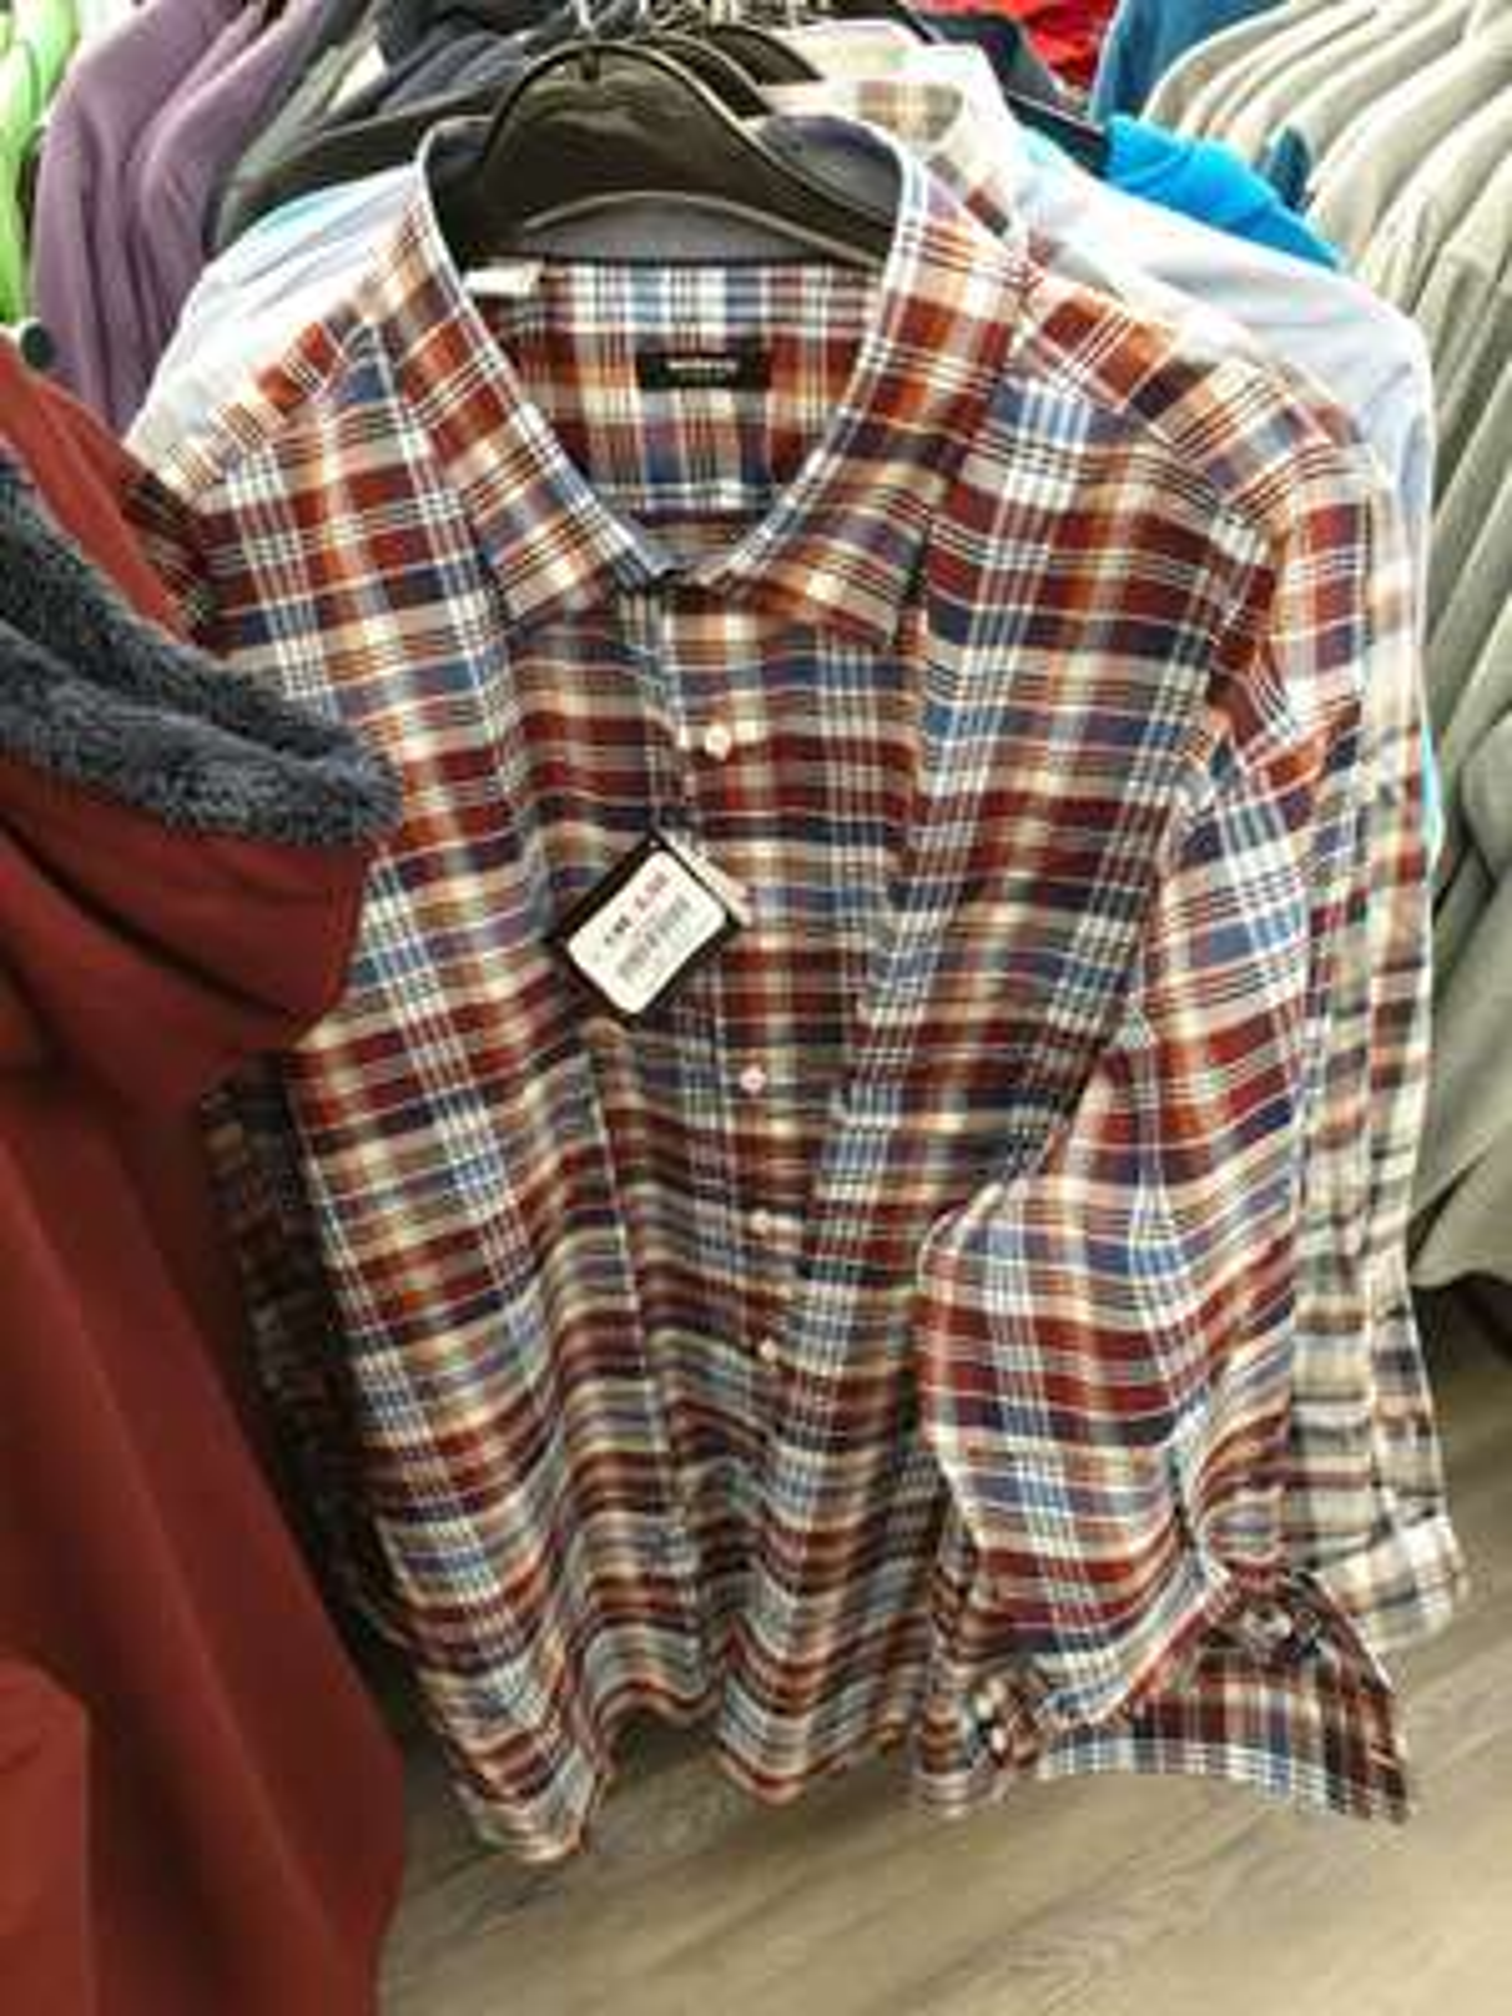 Walbusch Herren Hemden bei KIK